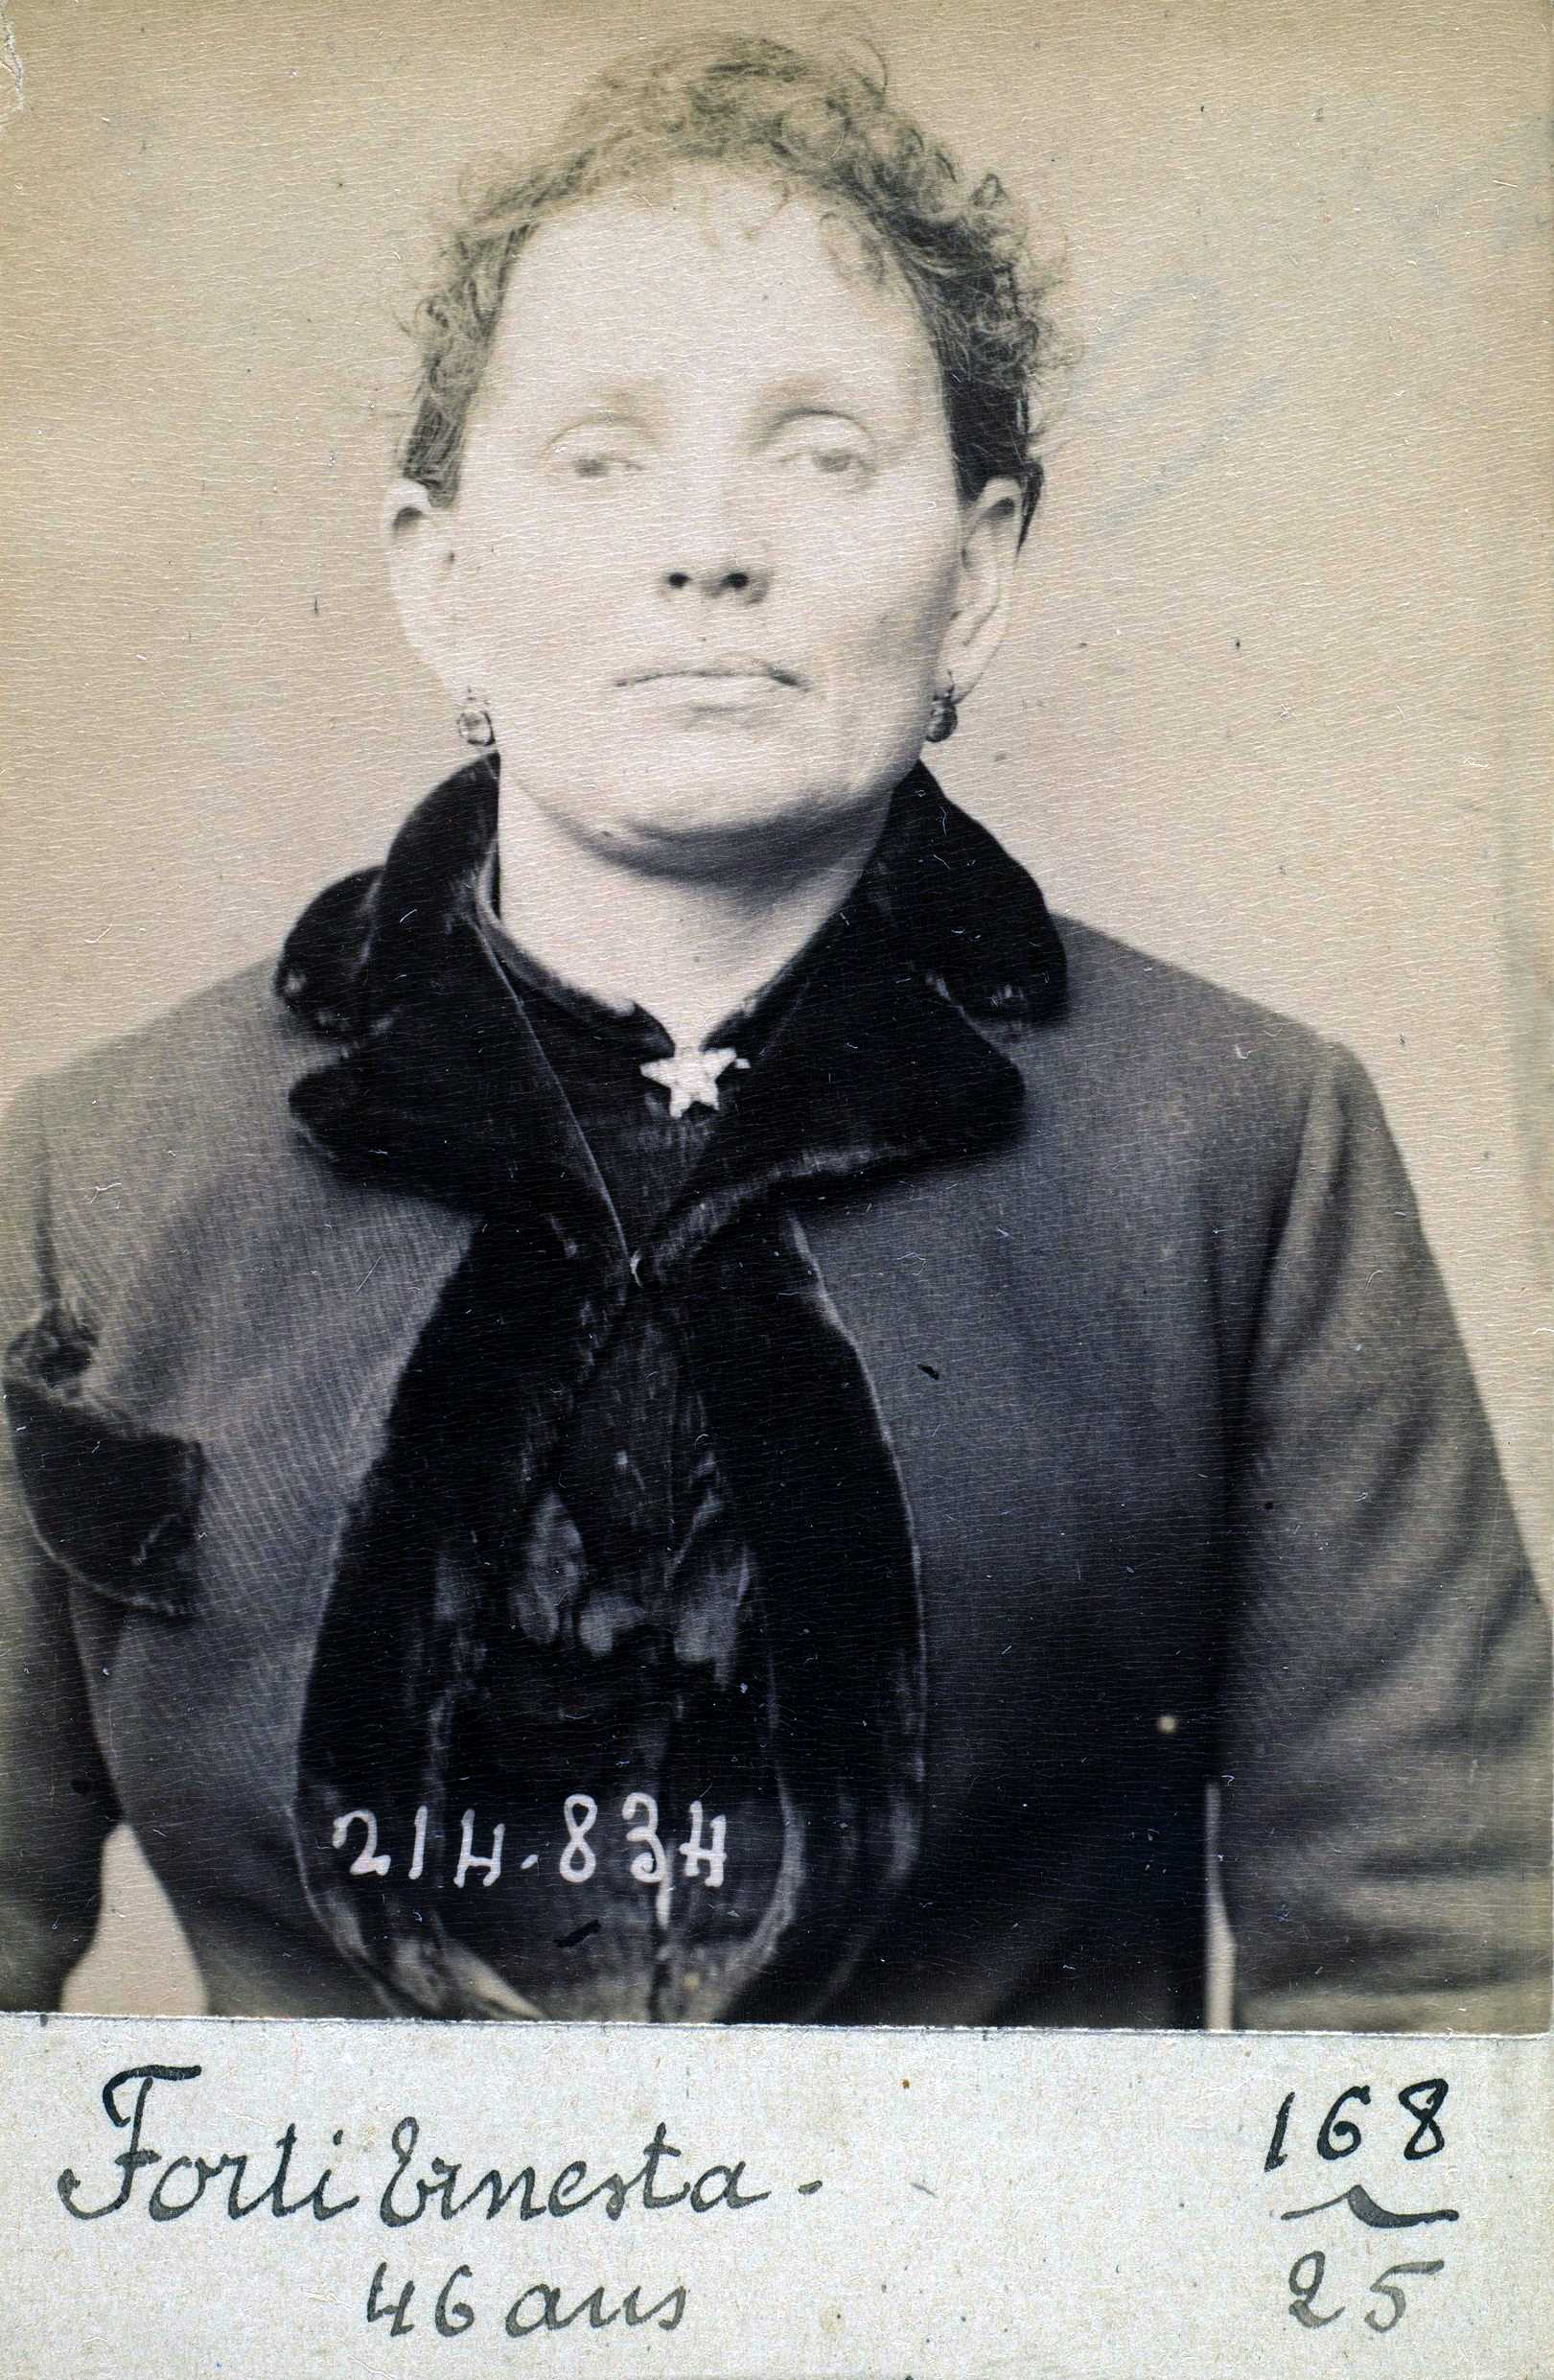 Foto policíaca d'Ernesta Forti (27 de febrer de 1894)